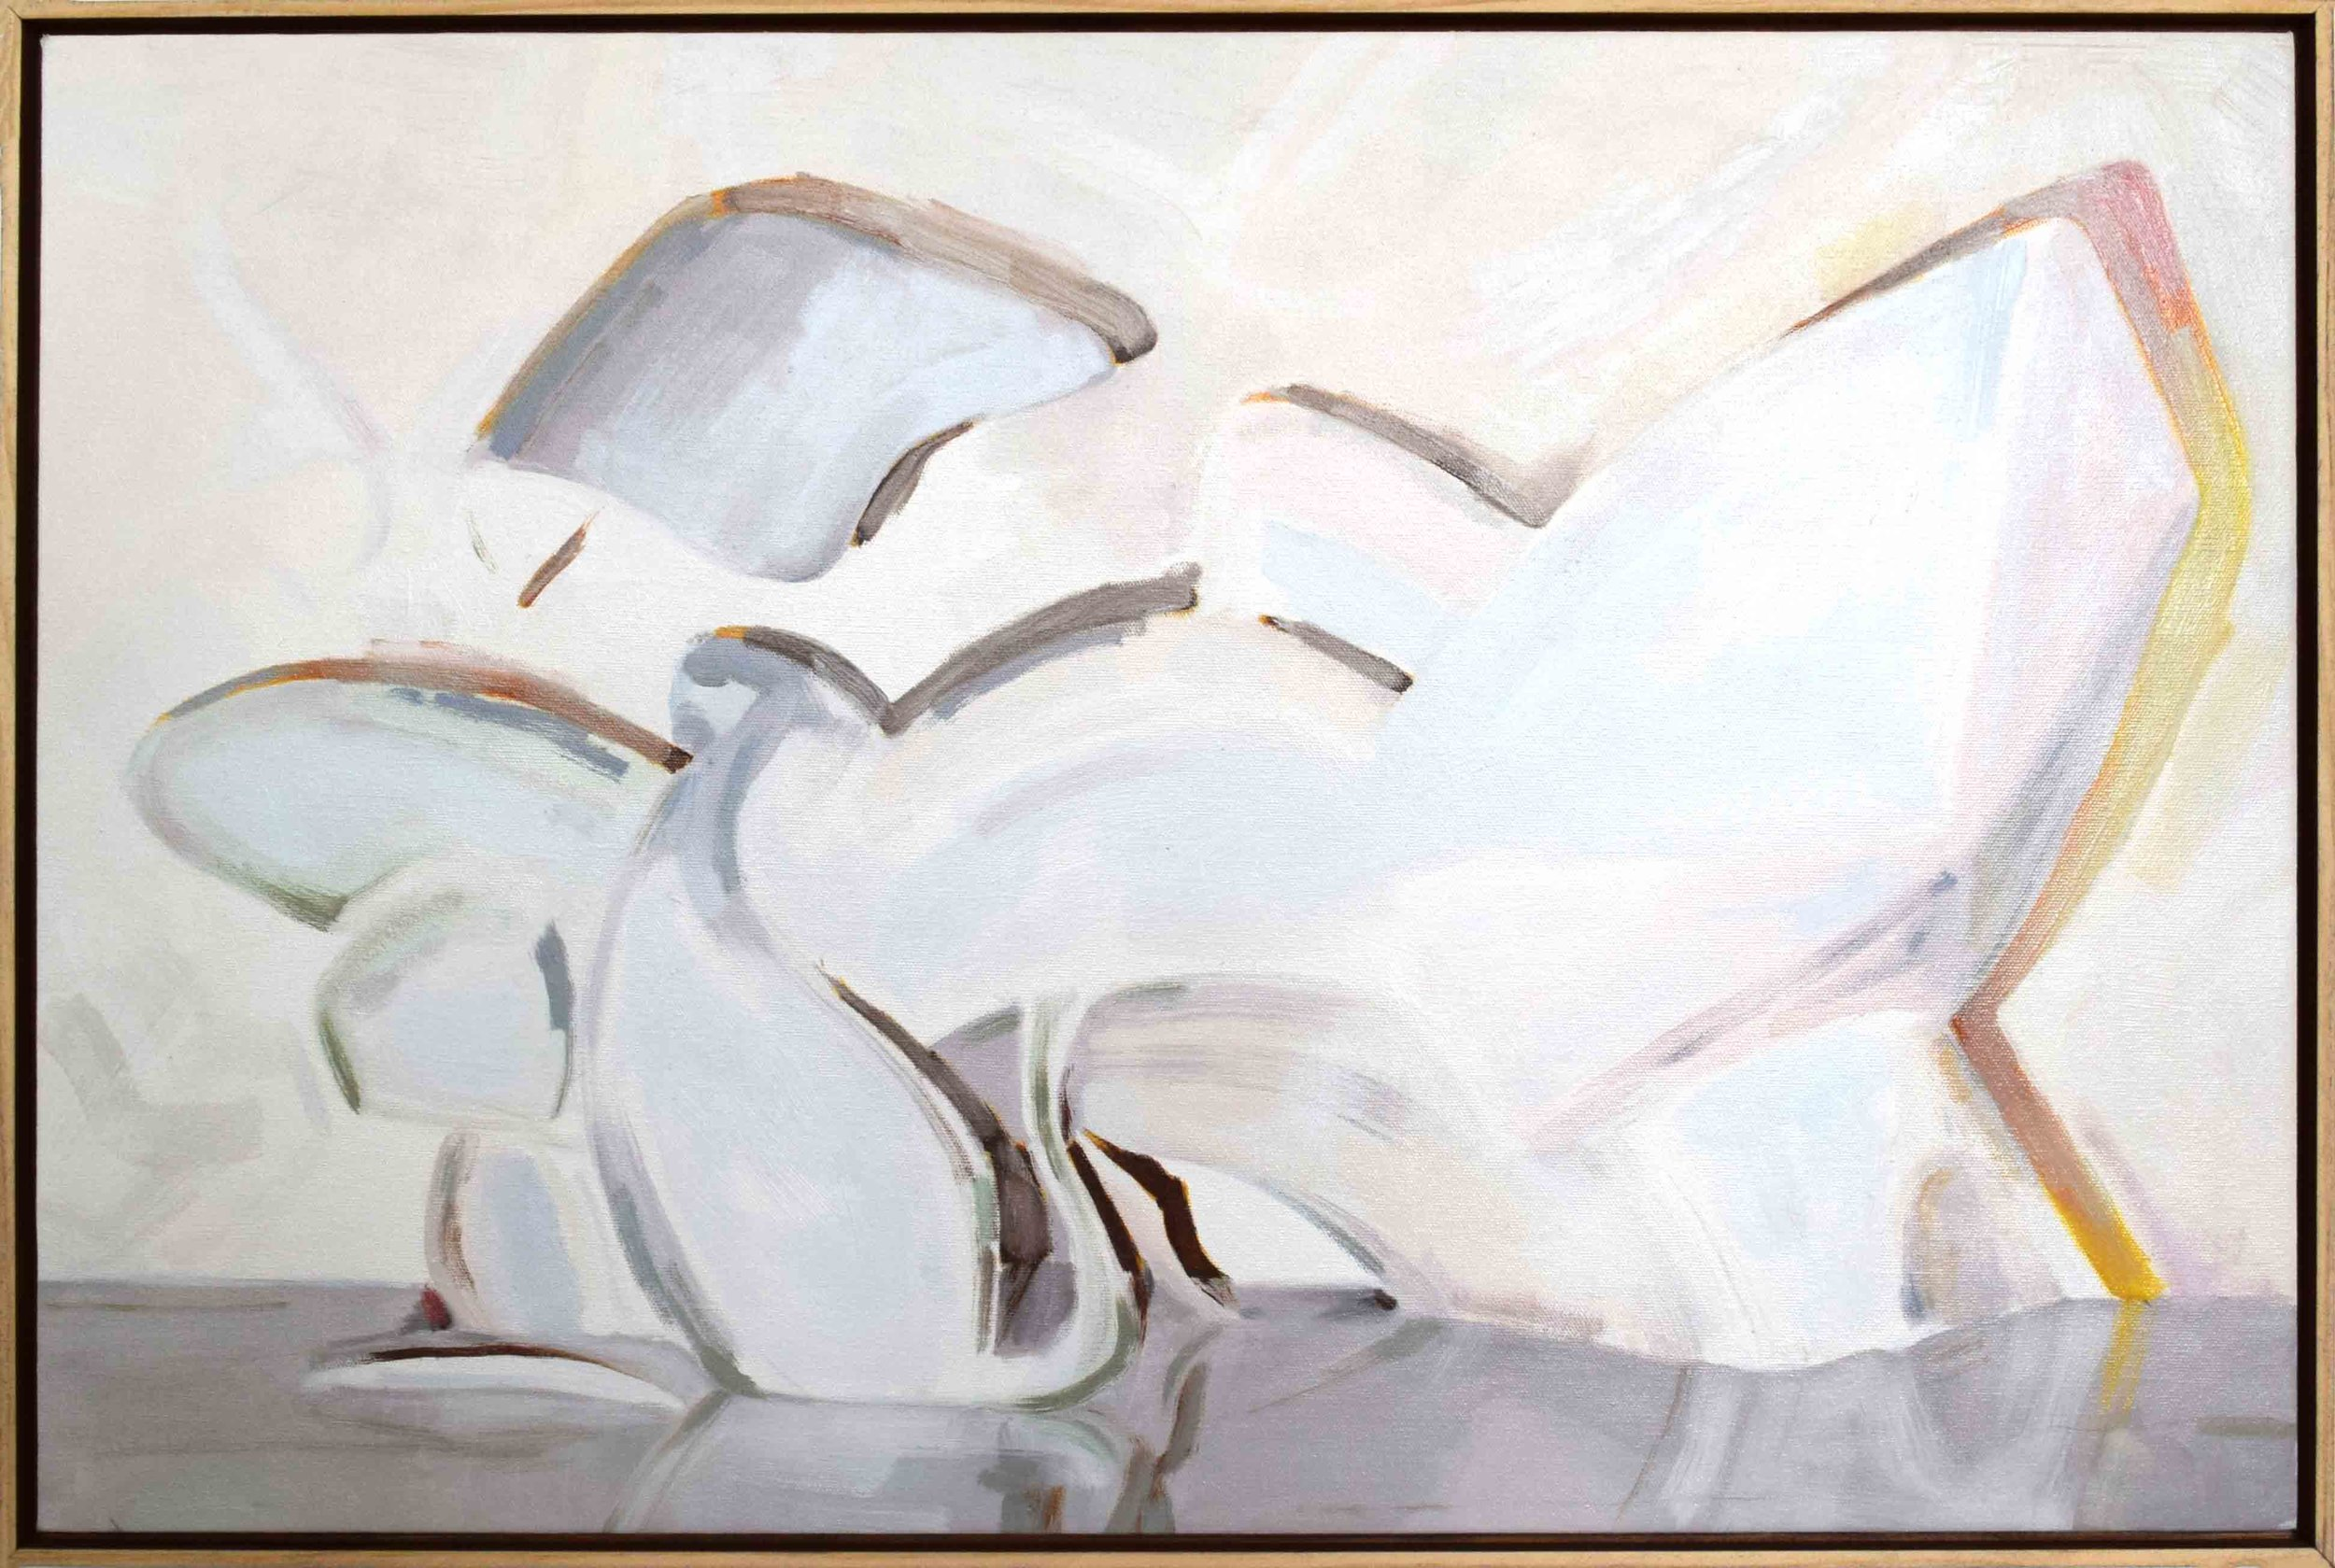 12. Ian Williams,  Illumine , 2018, oil on canvas, 50 x 76 cm $1,250